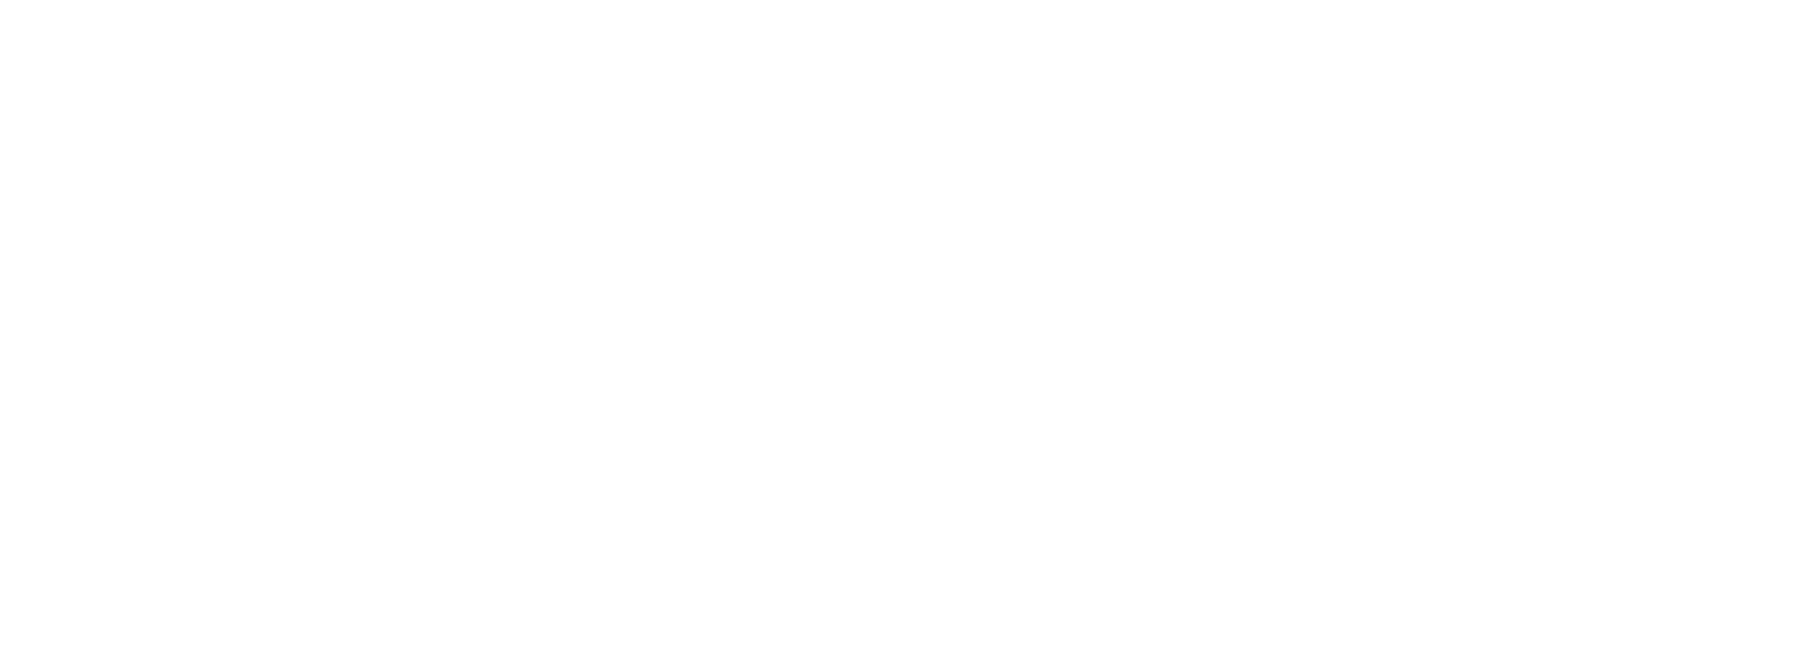 Halo logo white.png